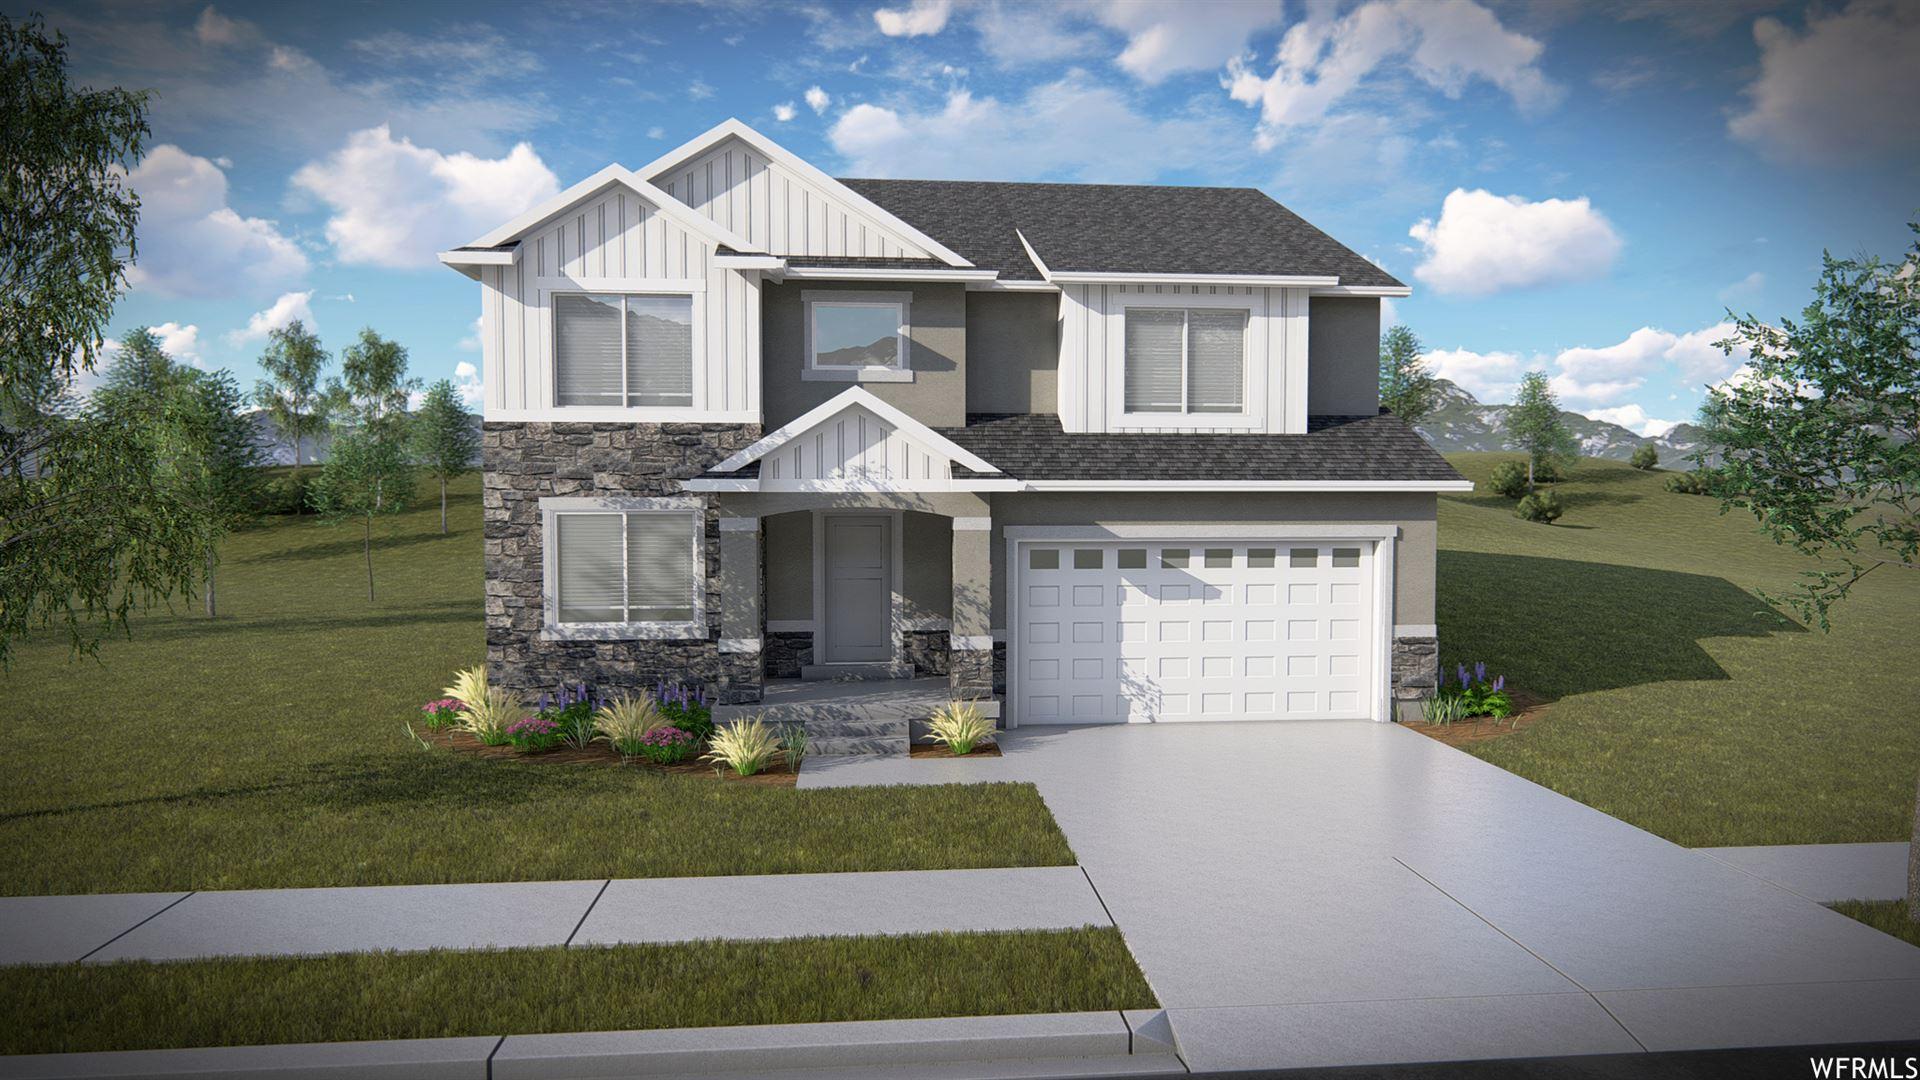 Photo of 1332 W QUAILHILL RD #1725, Saratoga Springs, UT 84045 (MLS # 1732078)